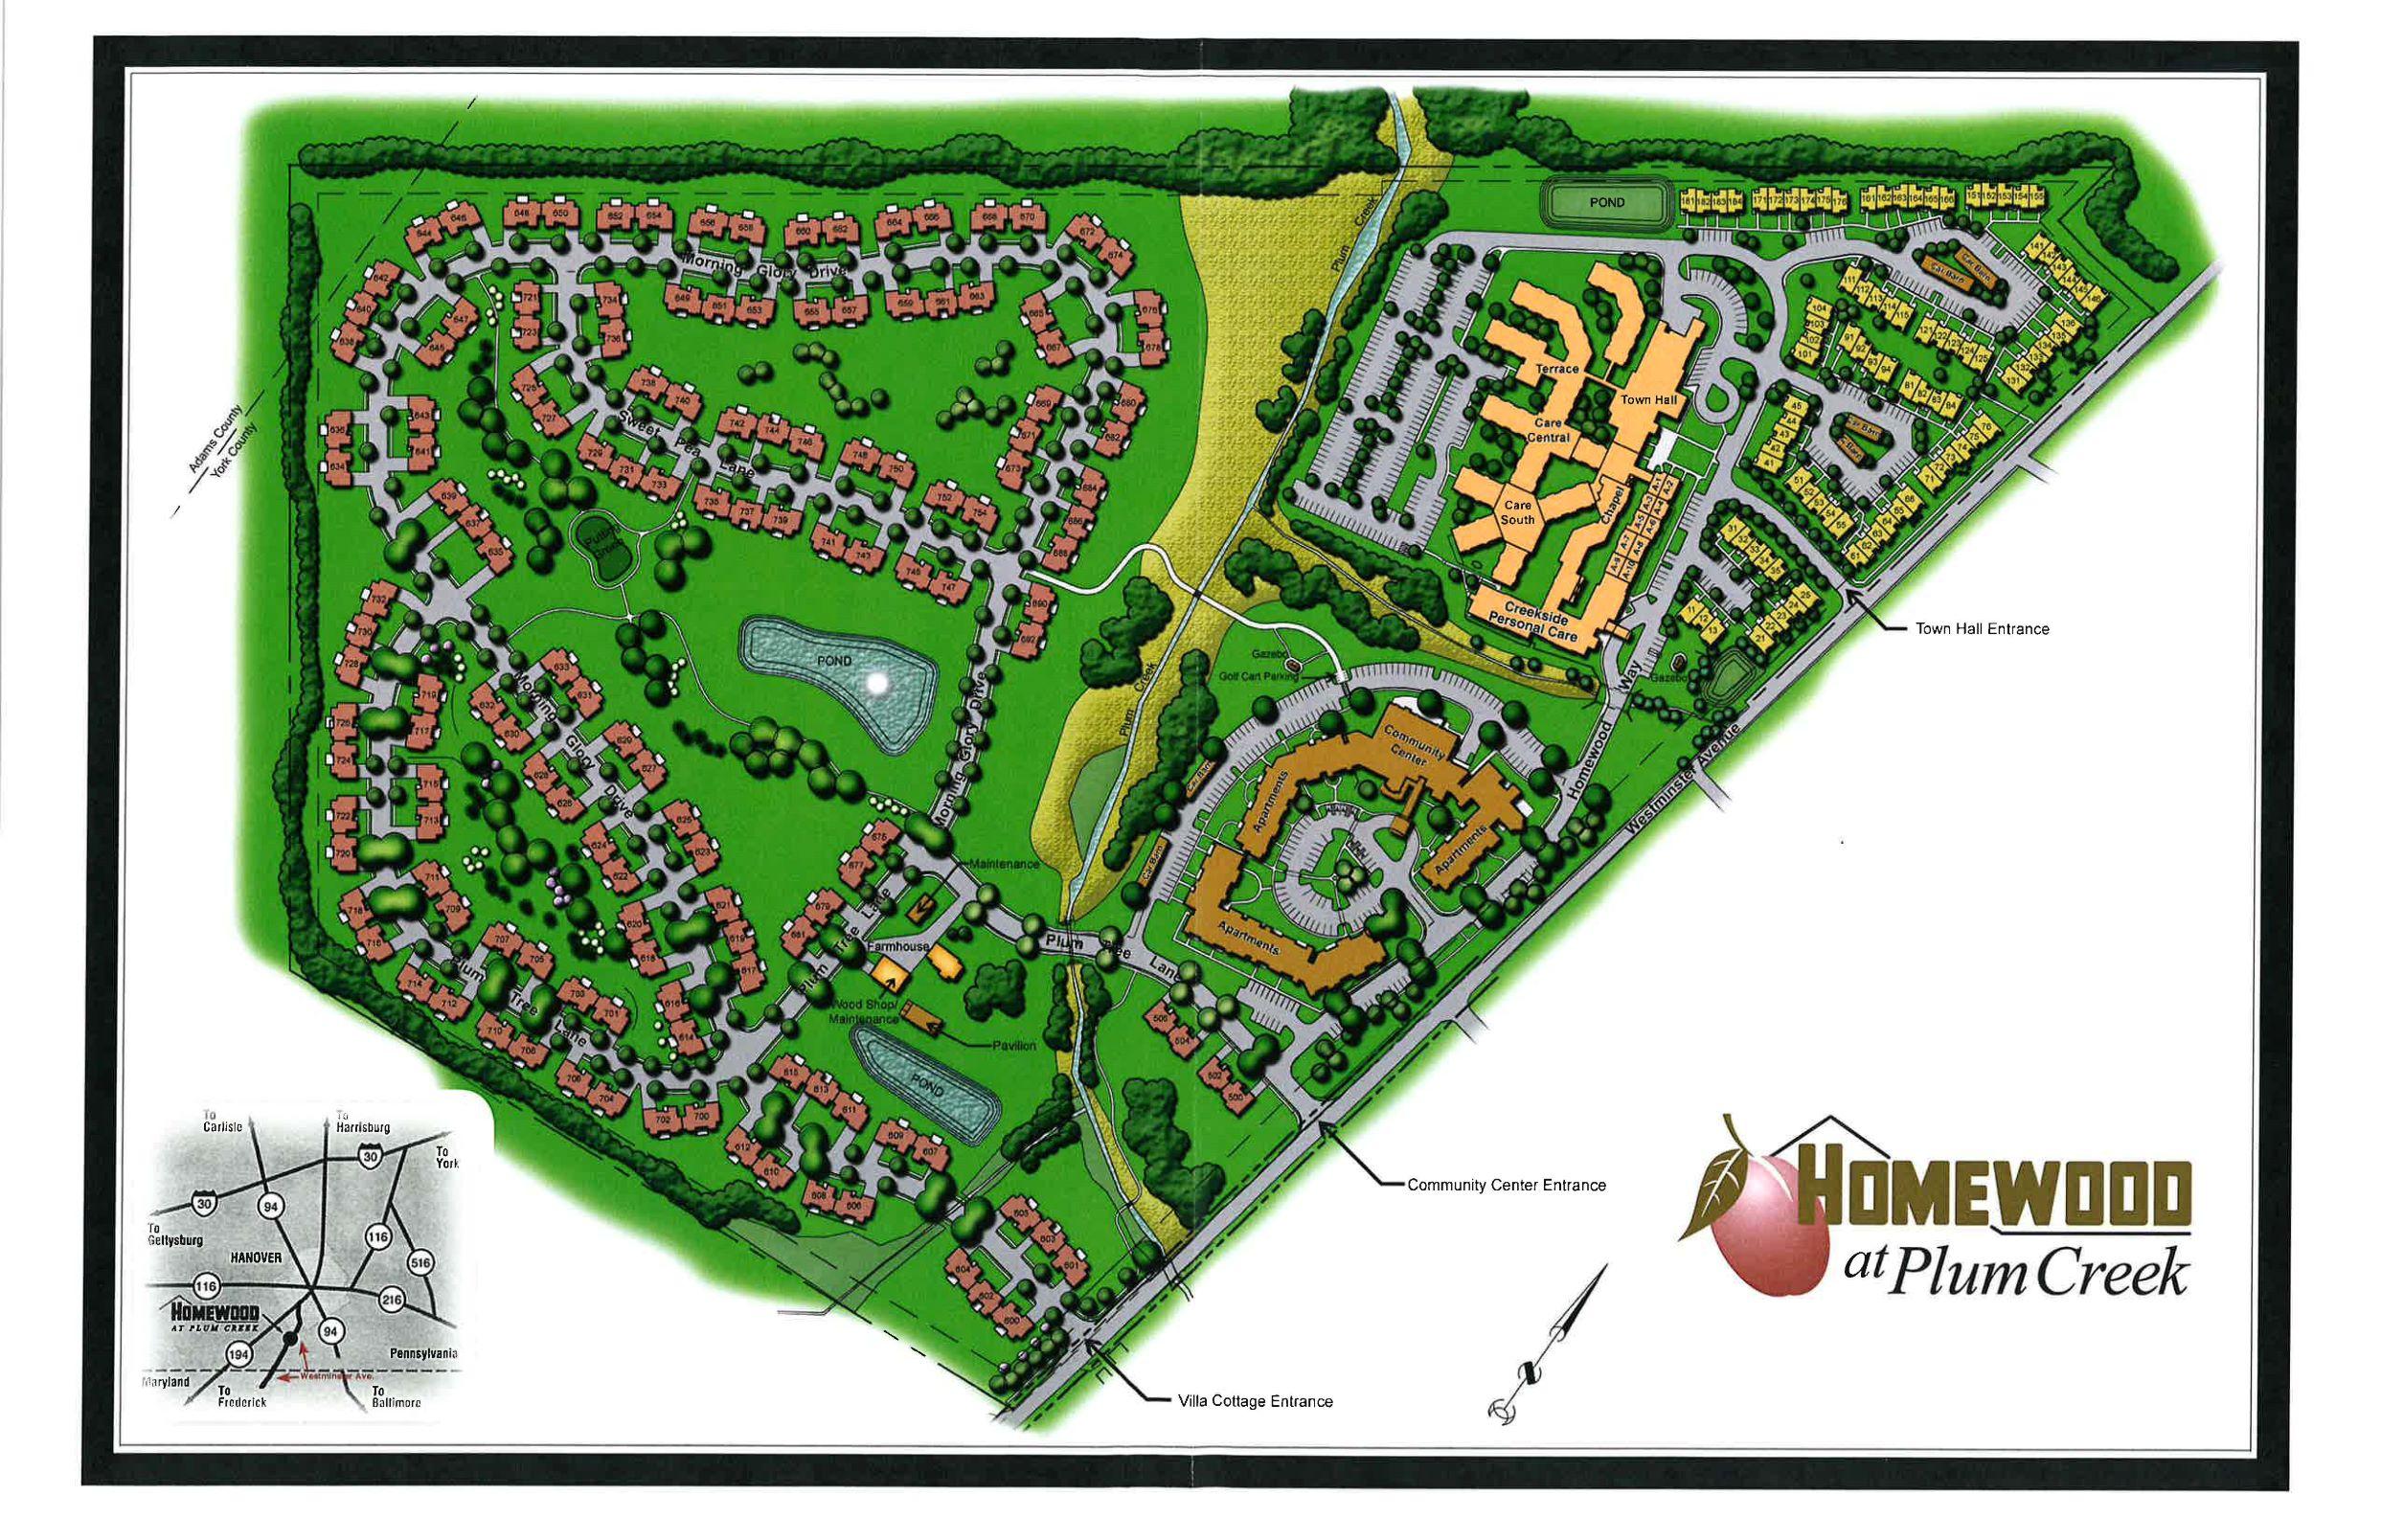 Map Of Campus Homewood At Plum Creek